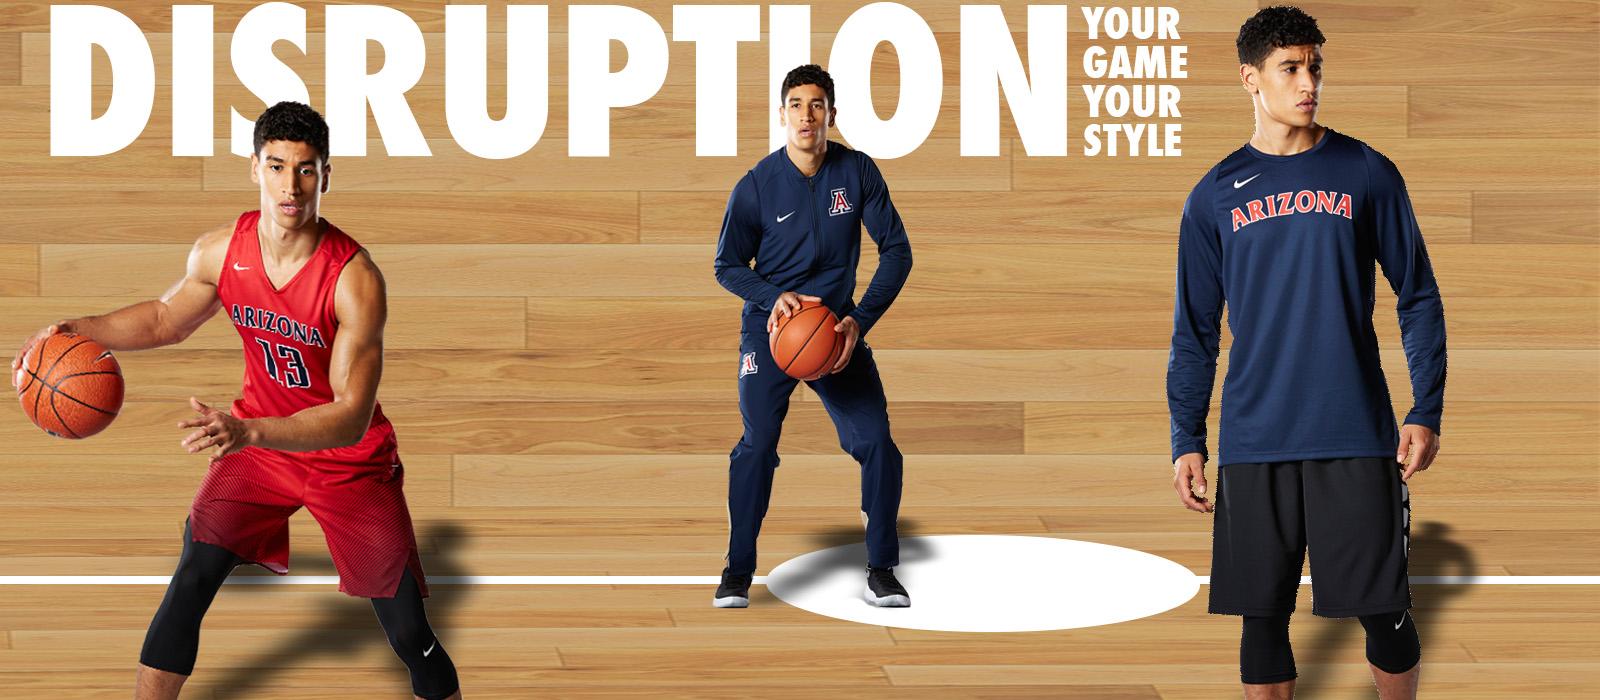 Basketball Uniform Creator 46